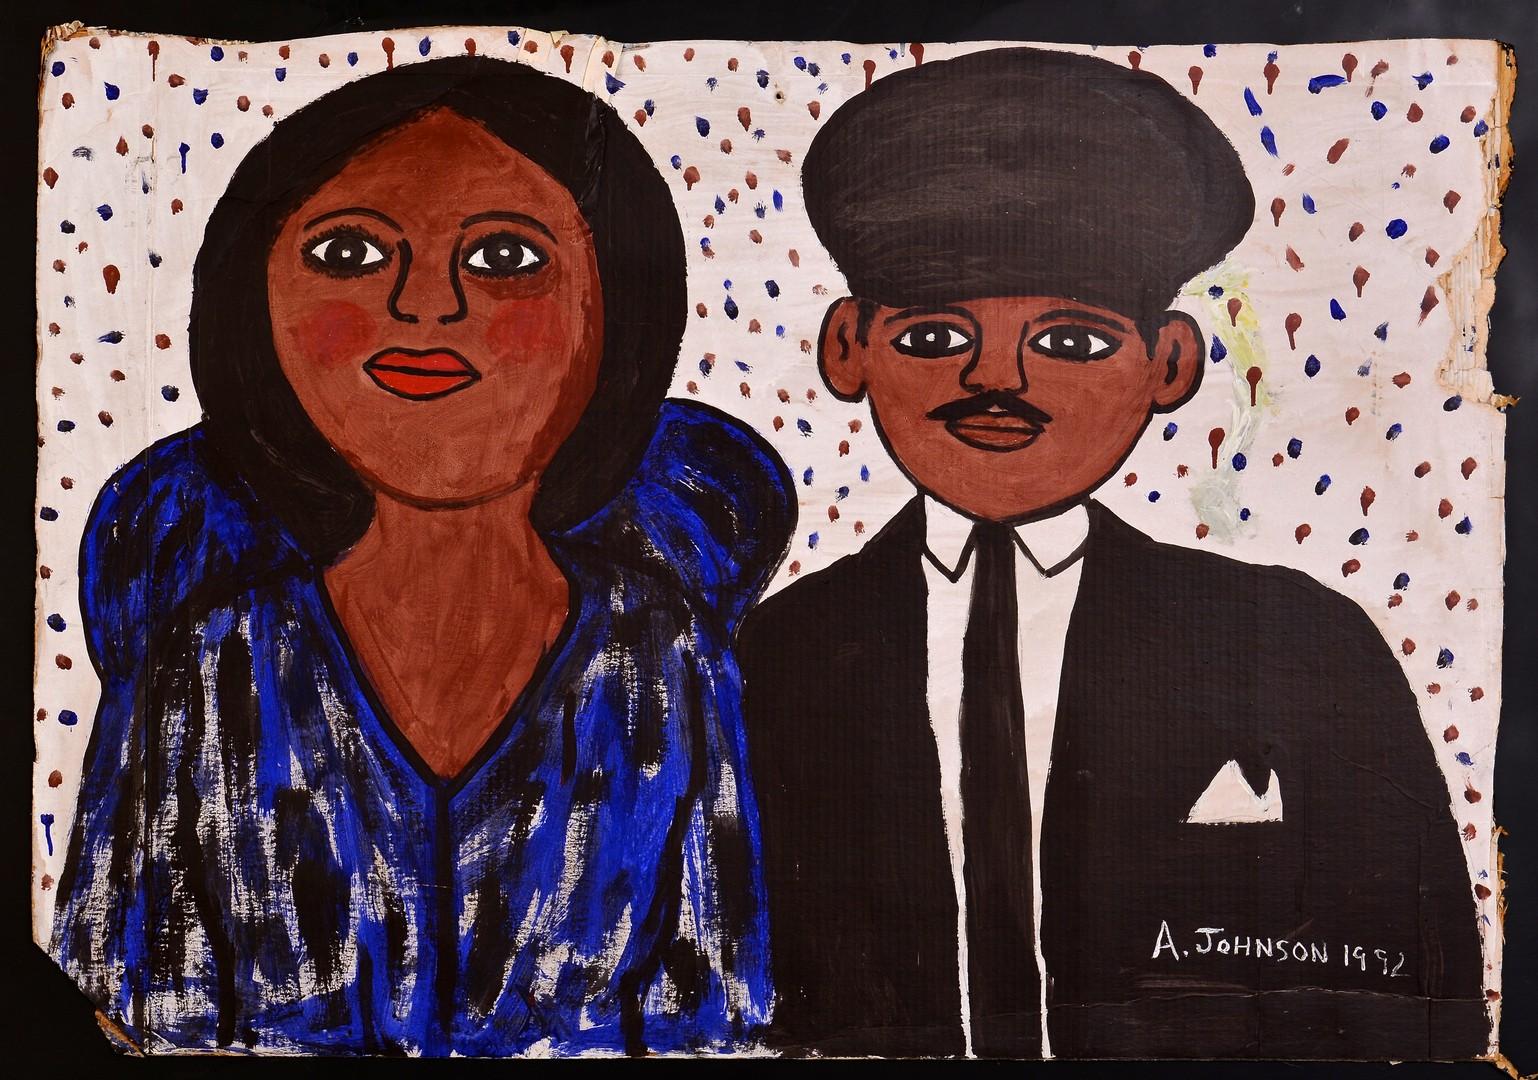 Lot 553: Anderson Johnson, outsider art portrait